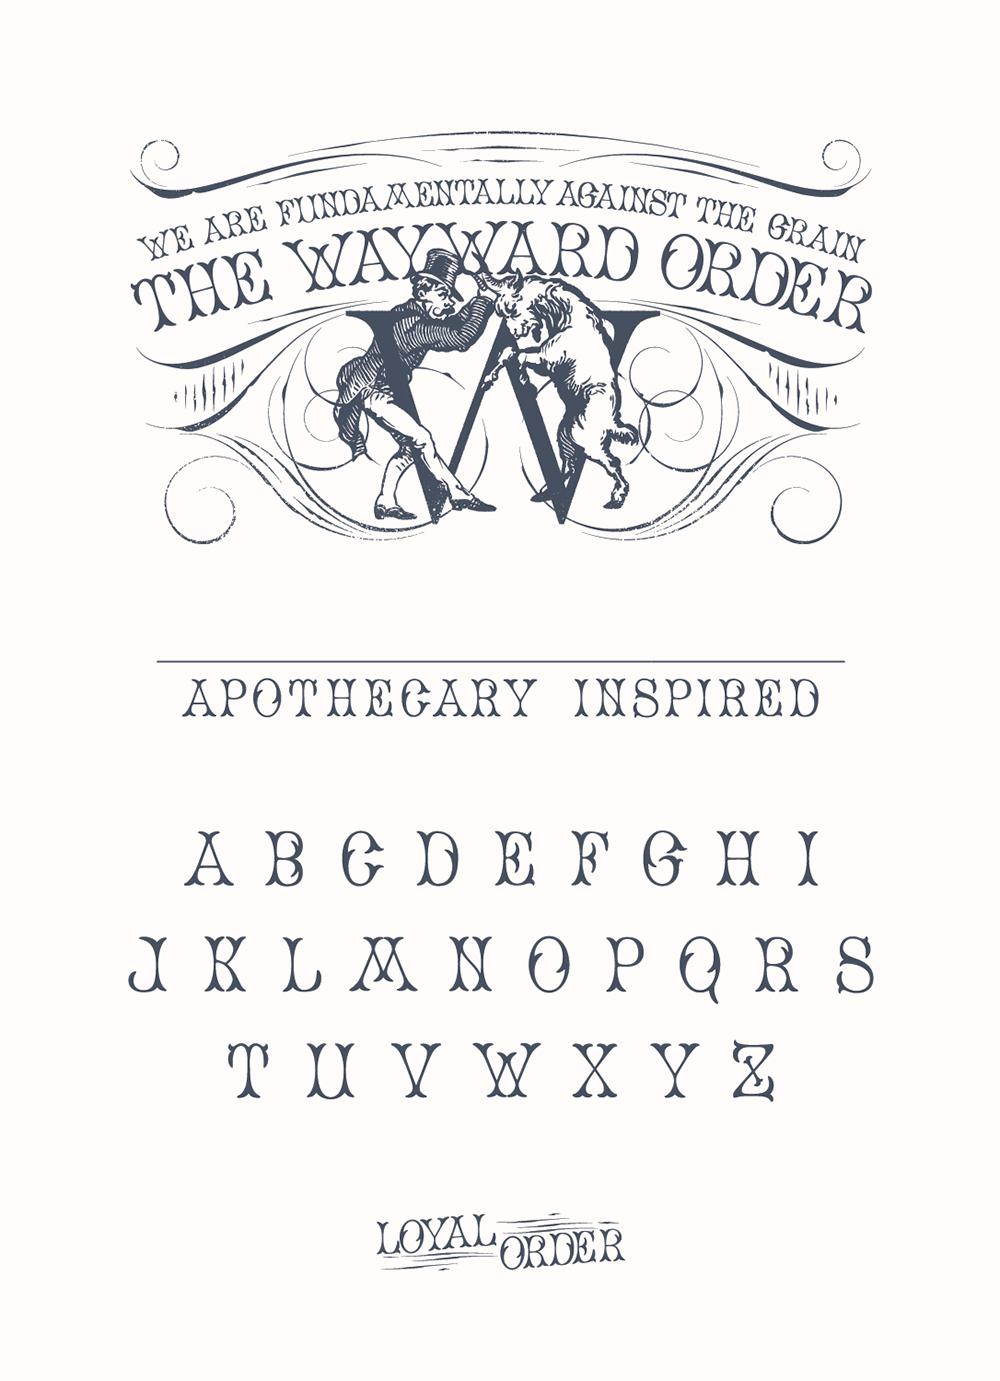 Packaging Design for Wayward Distillation House's Wayward Order